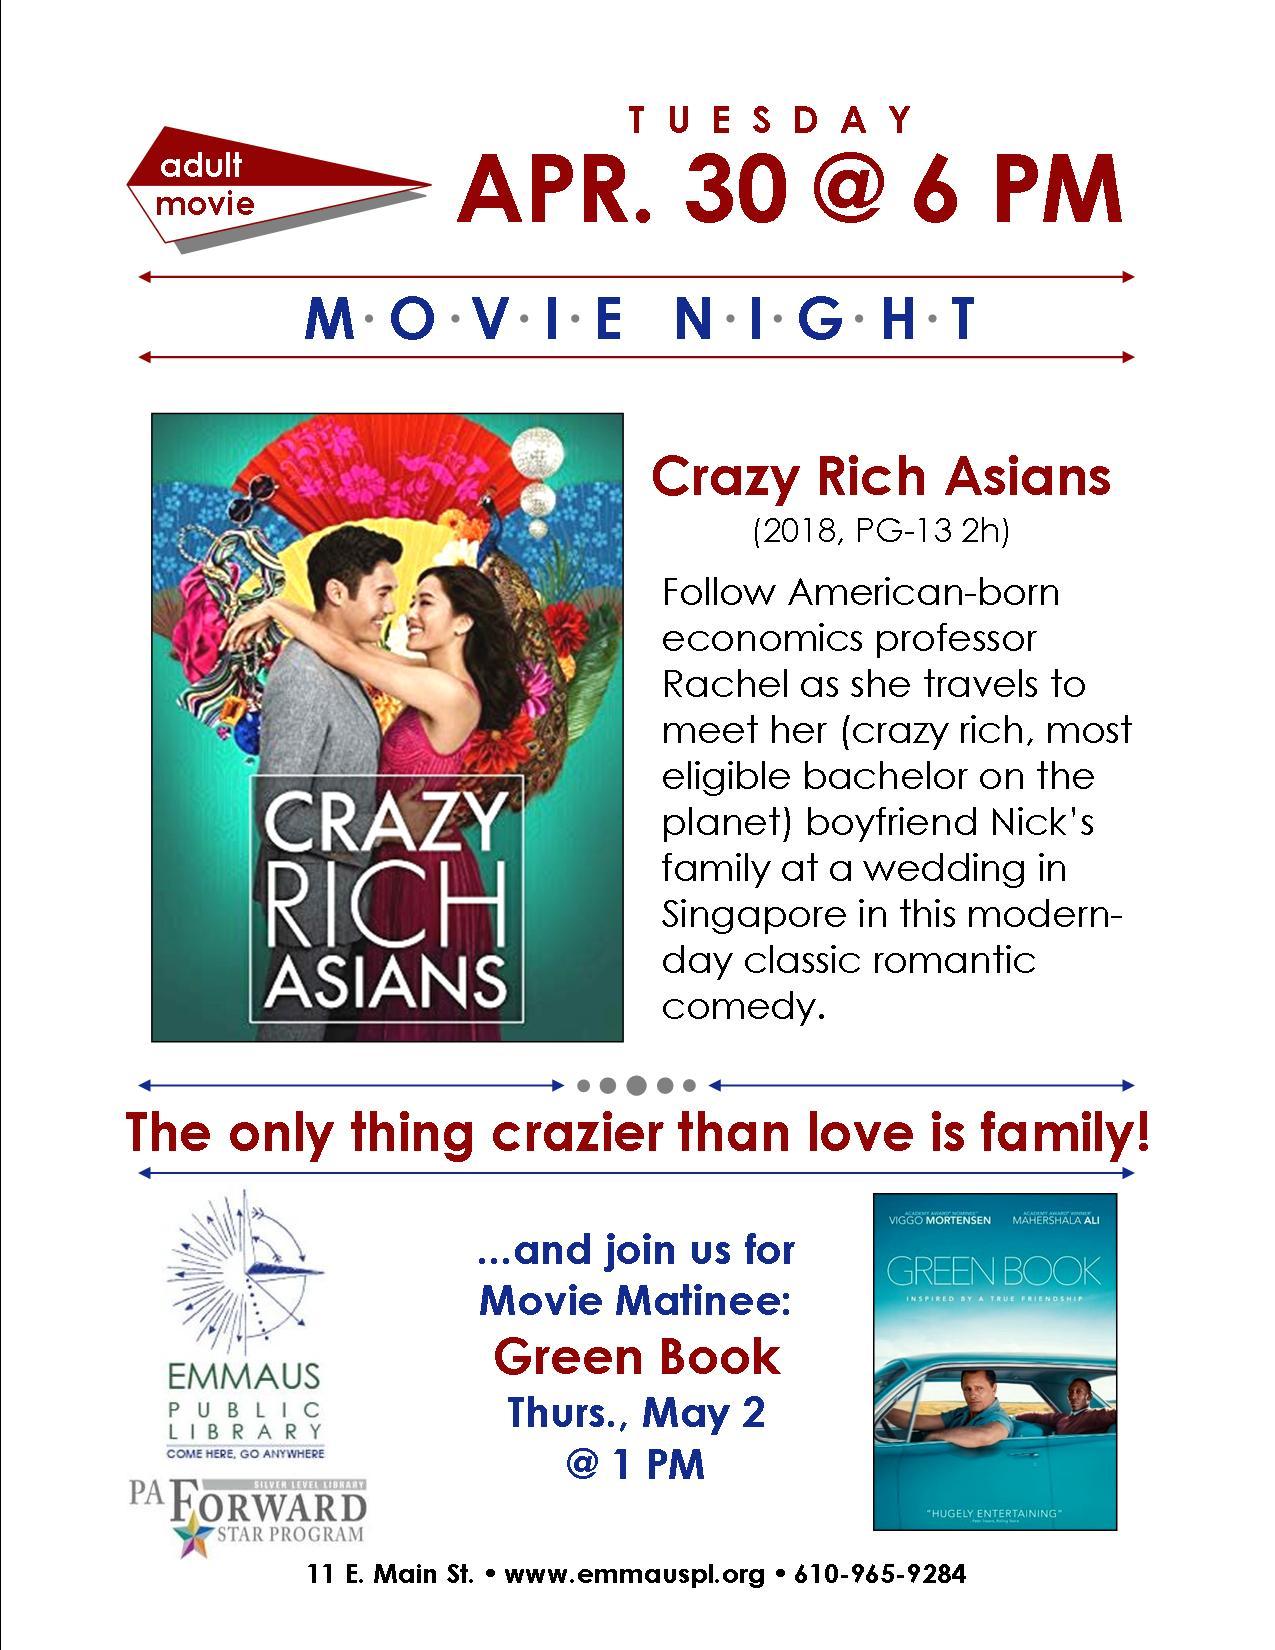 Movie Night: Crazy Rich Asians - Emmaus Public Library